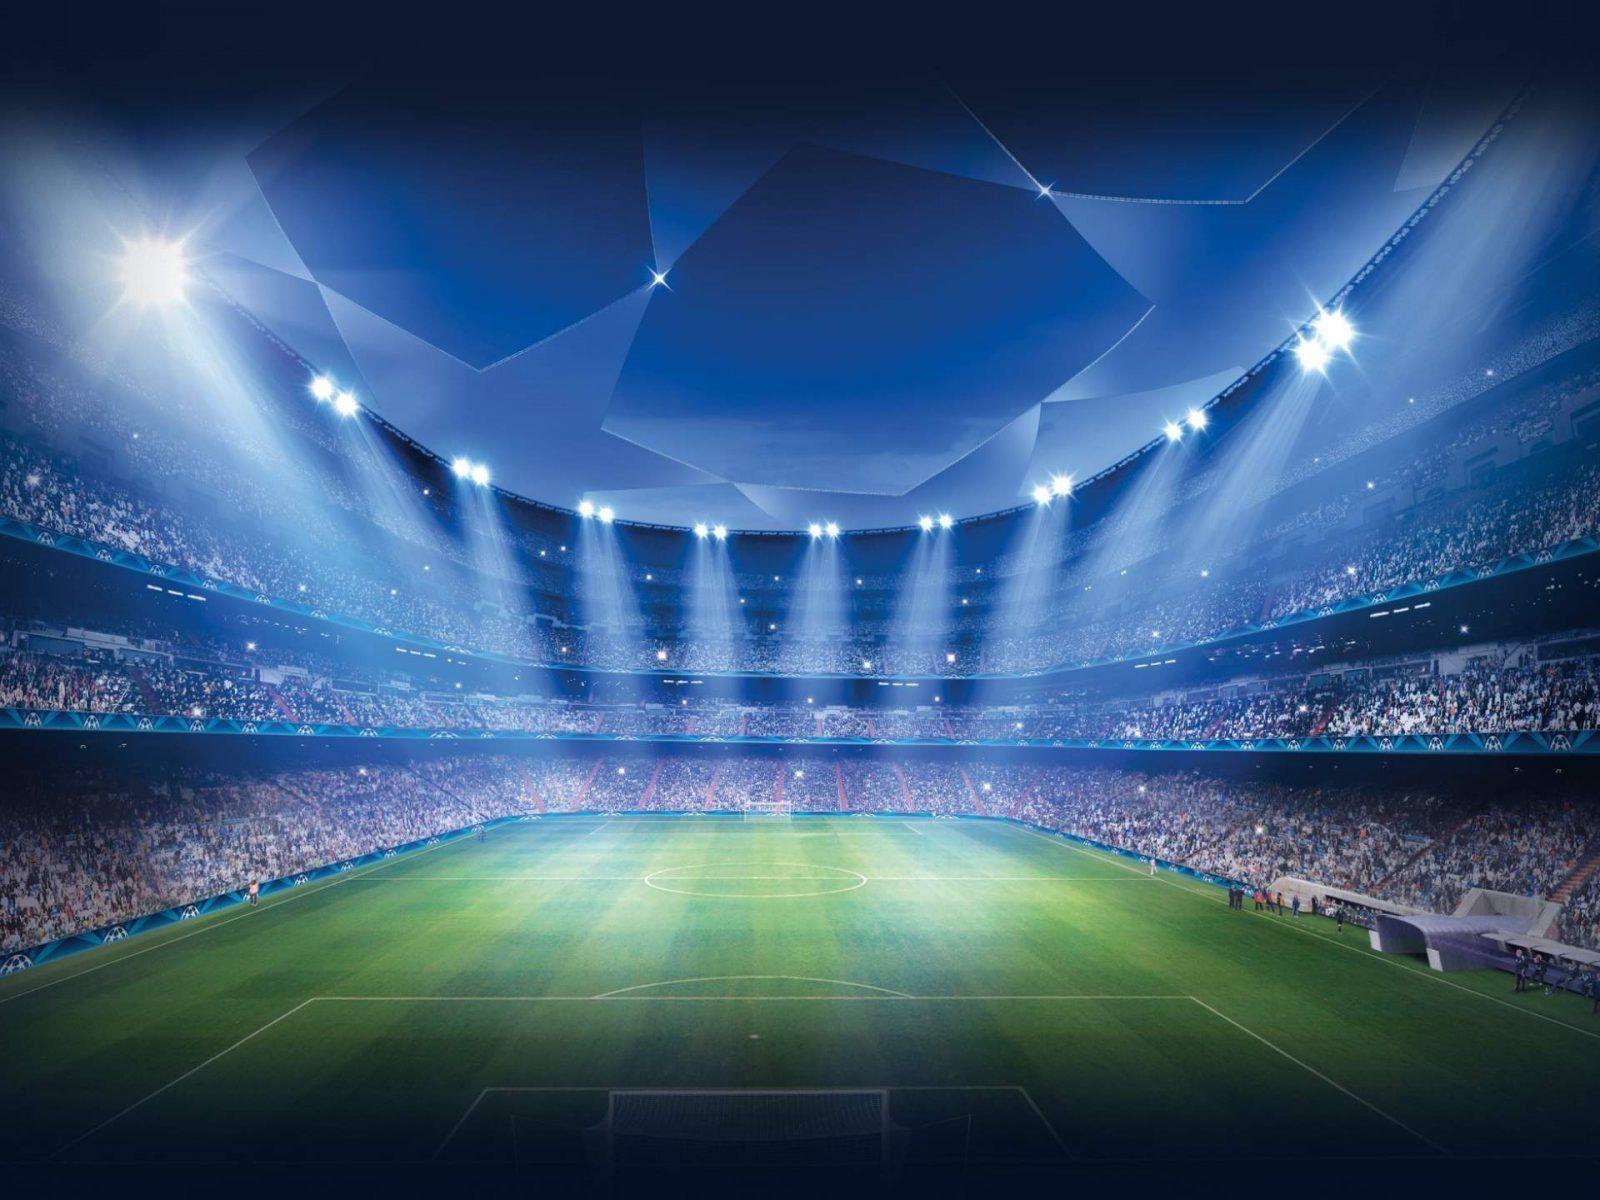 Champions League Stadium Wallpapers On Wallpaperdog